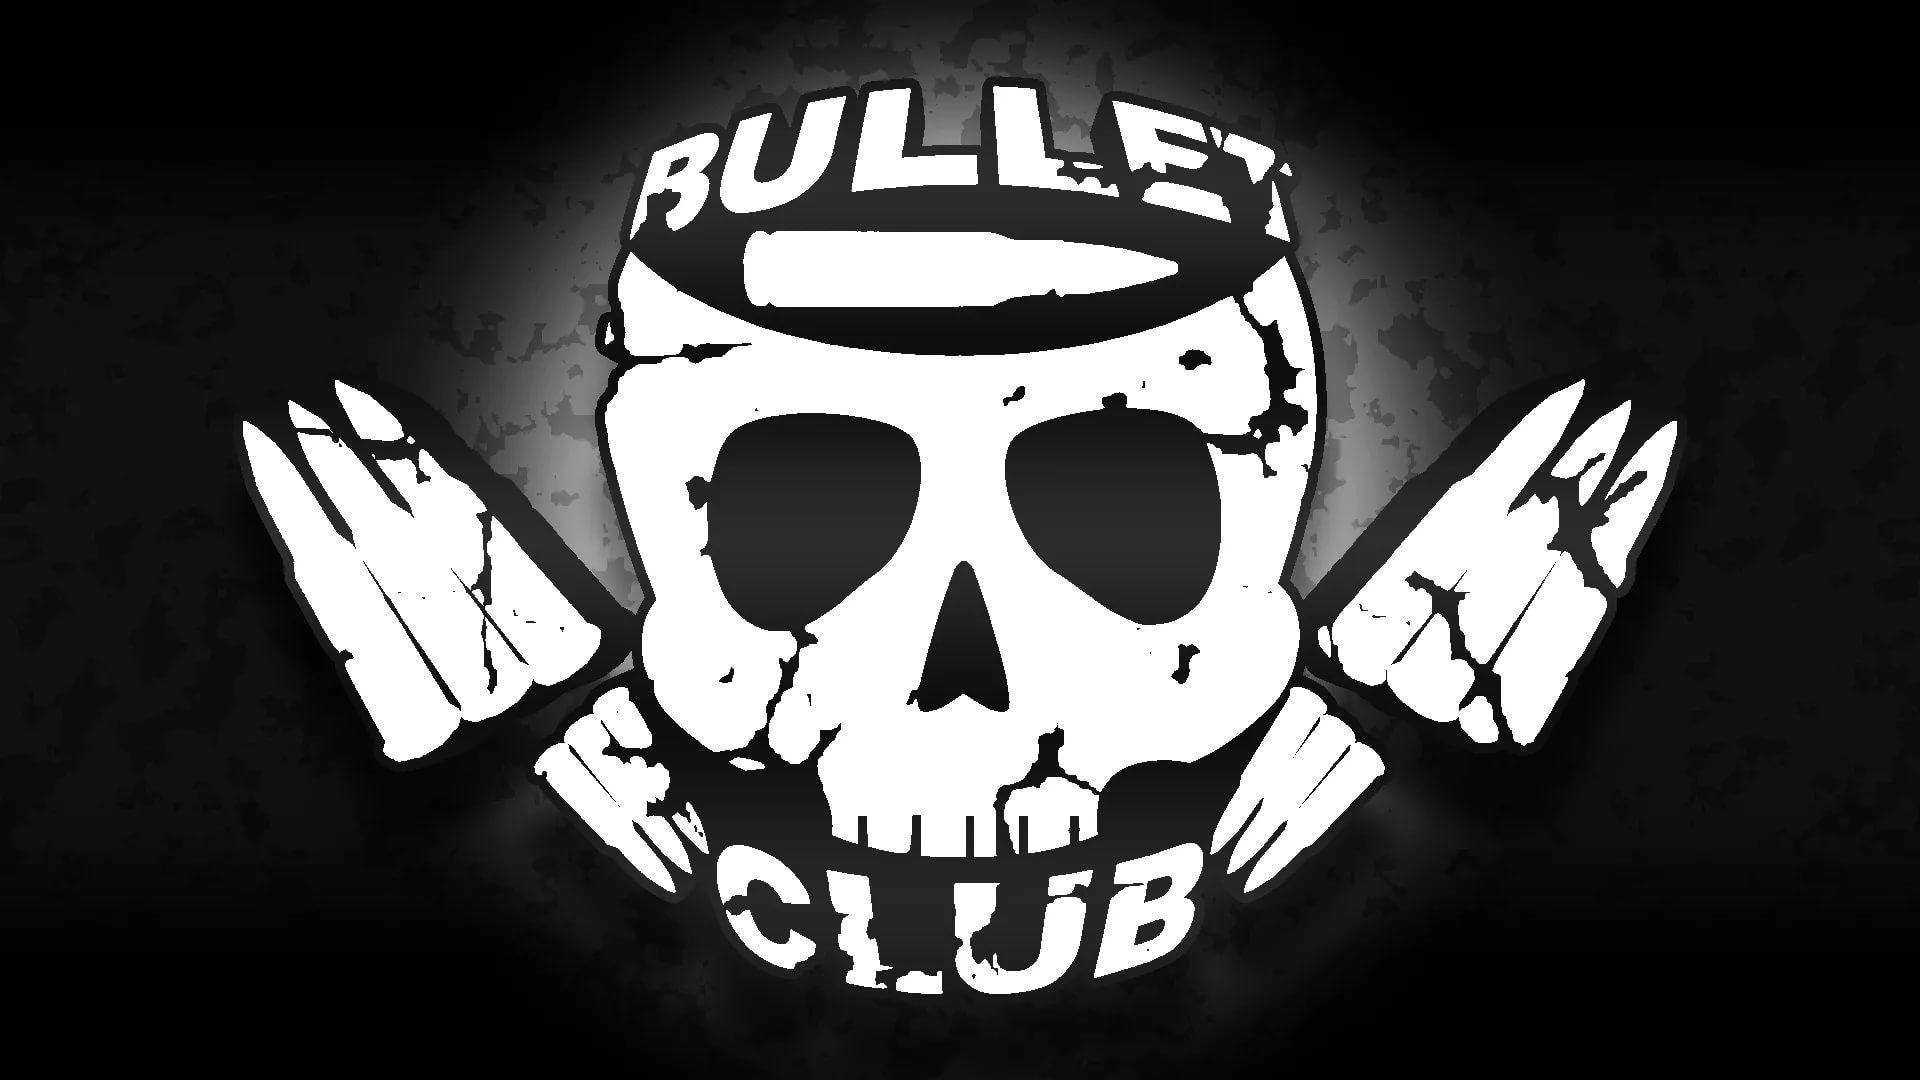 Bullet Club PC Wallpaper